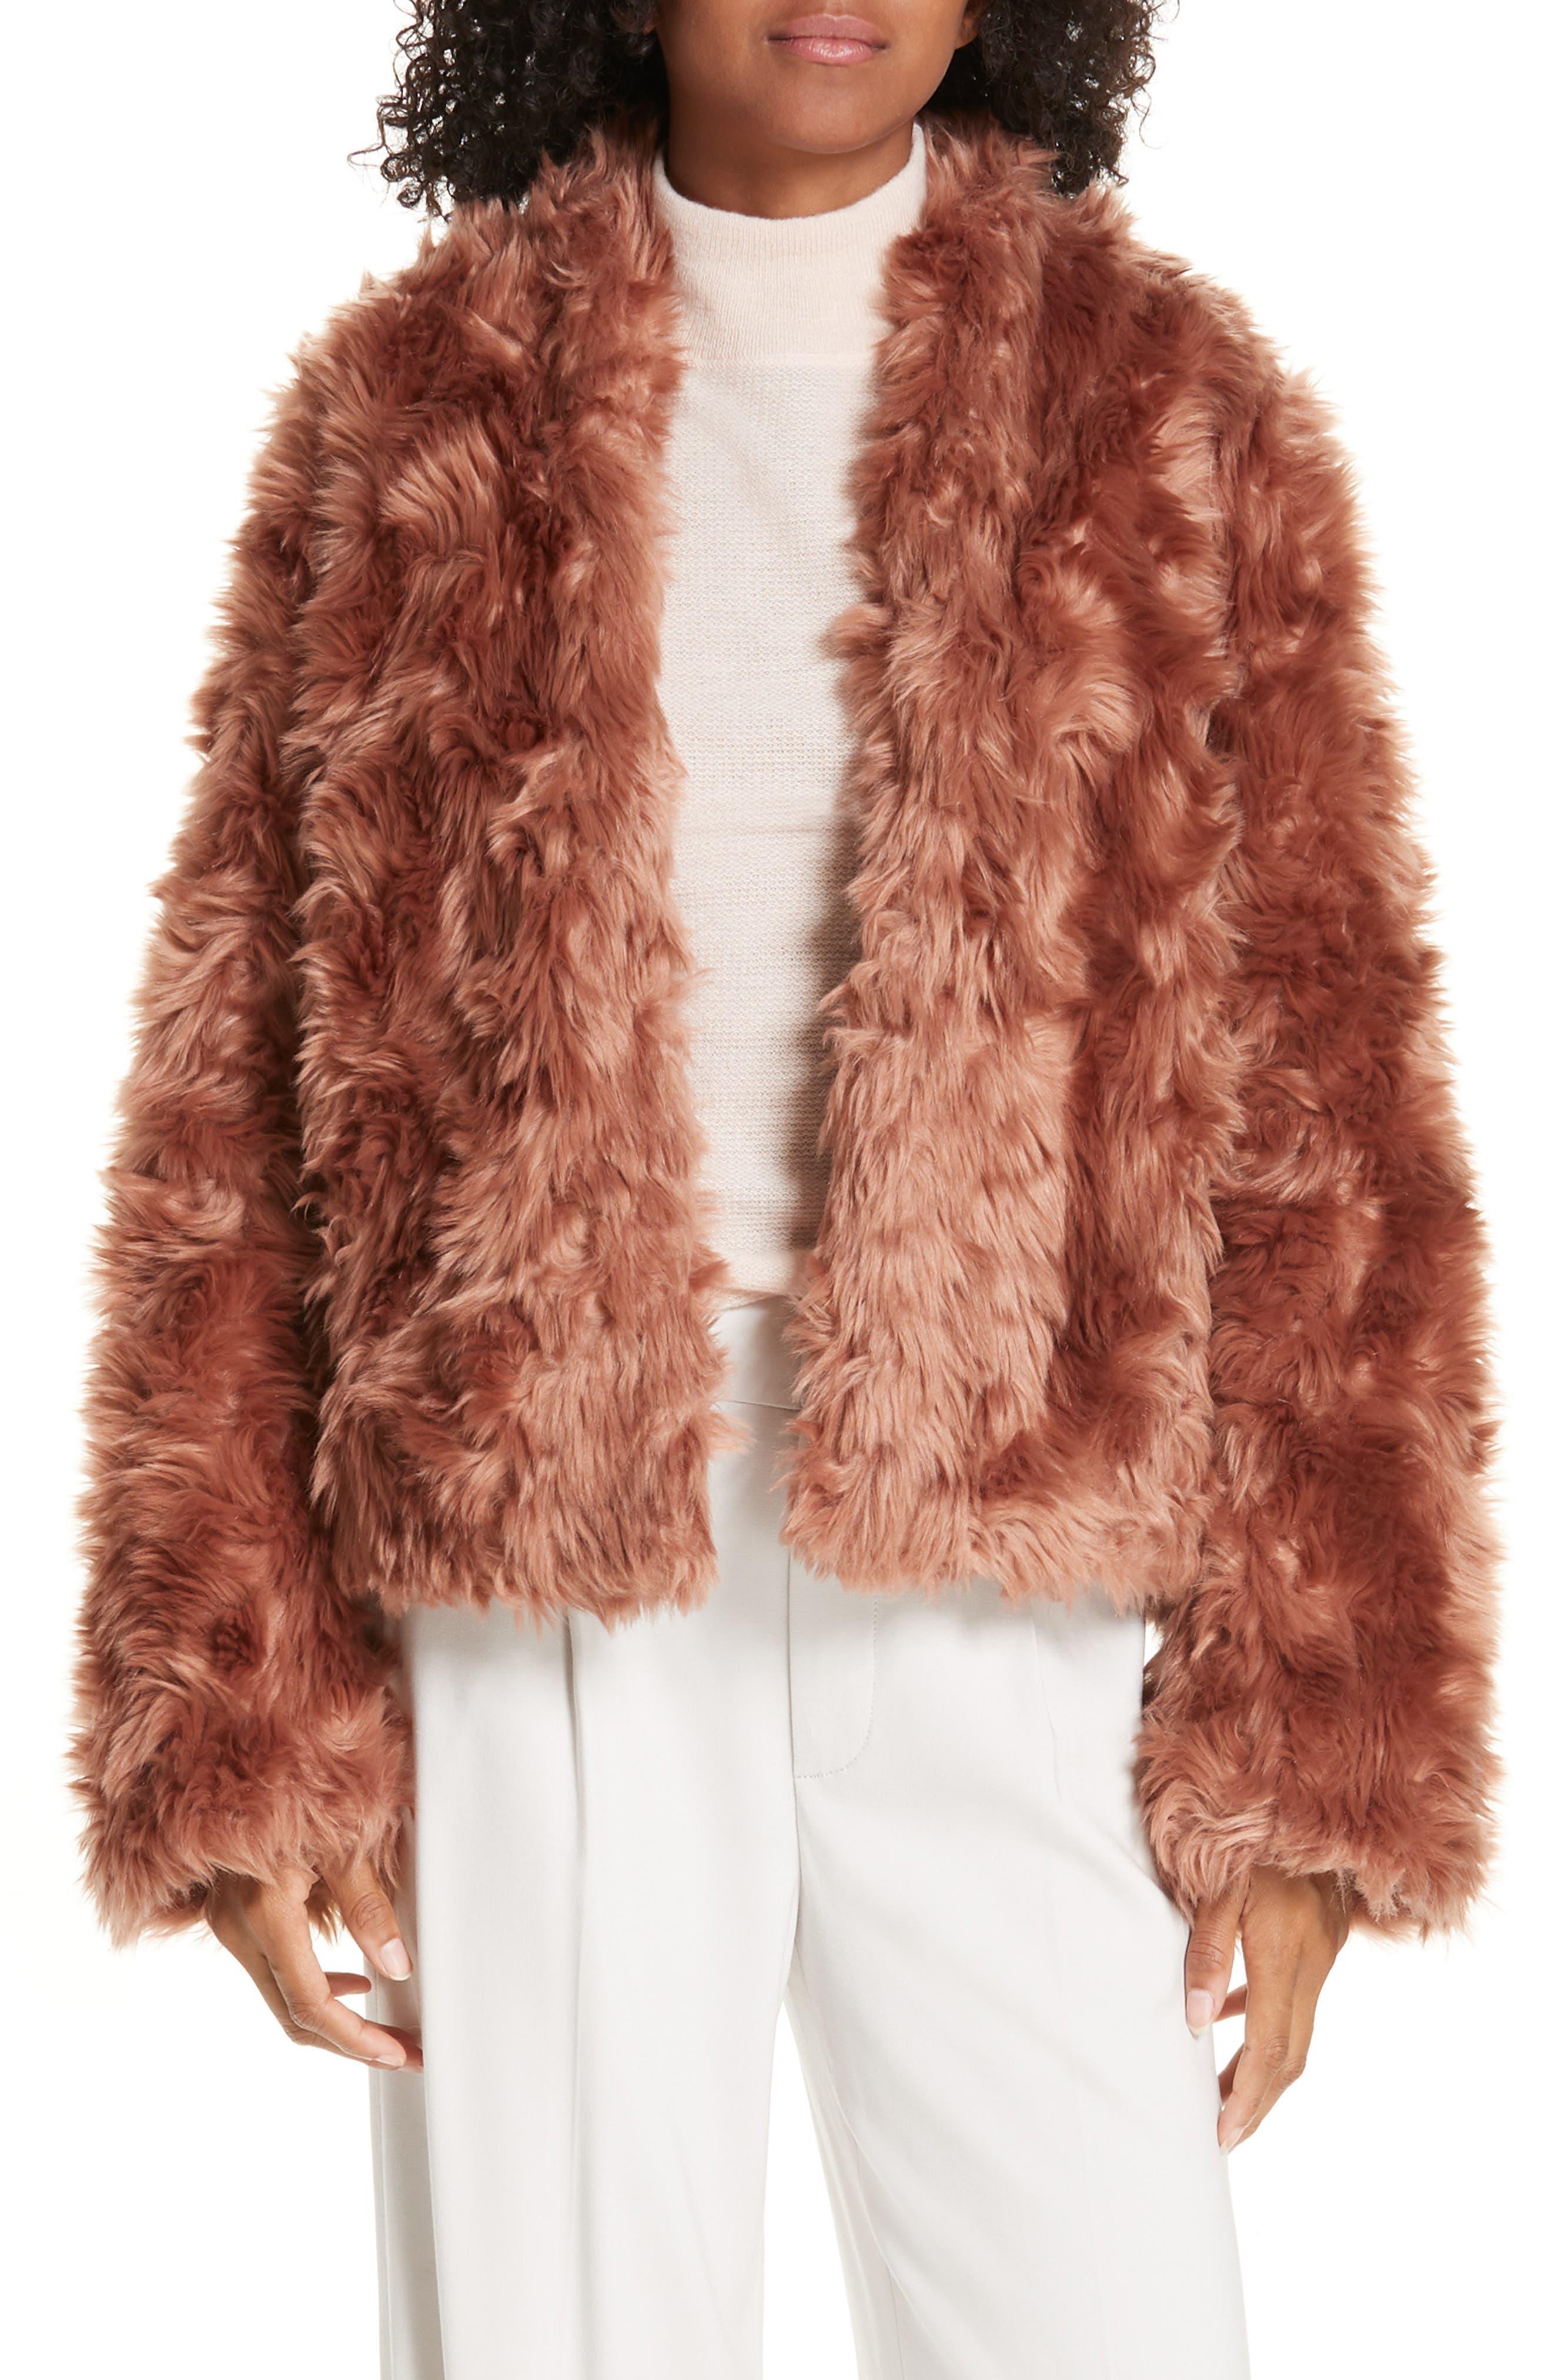 VINCE, Plush Faux Fur Jacket, Main thumbnail 1, color, PINK UMBER